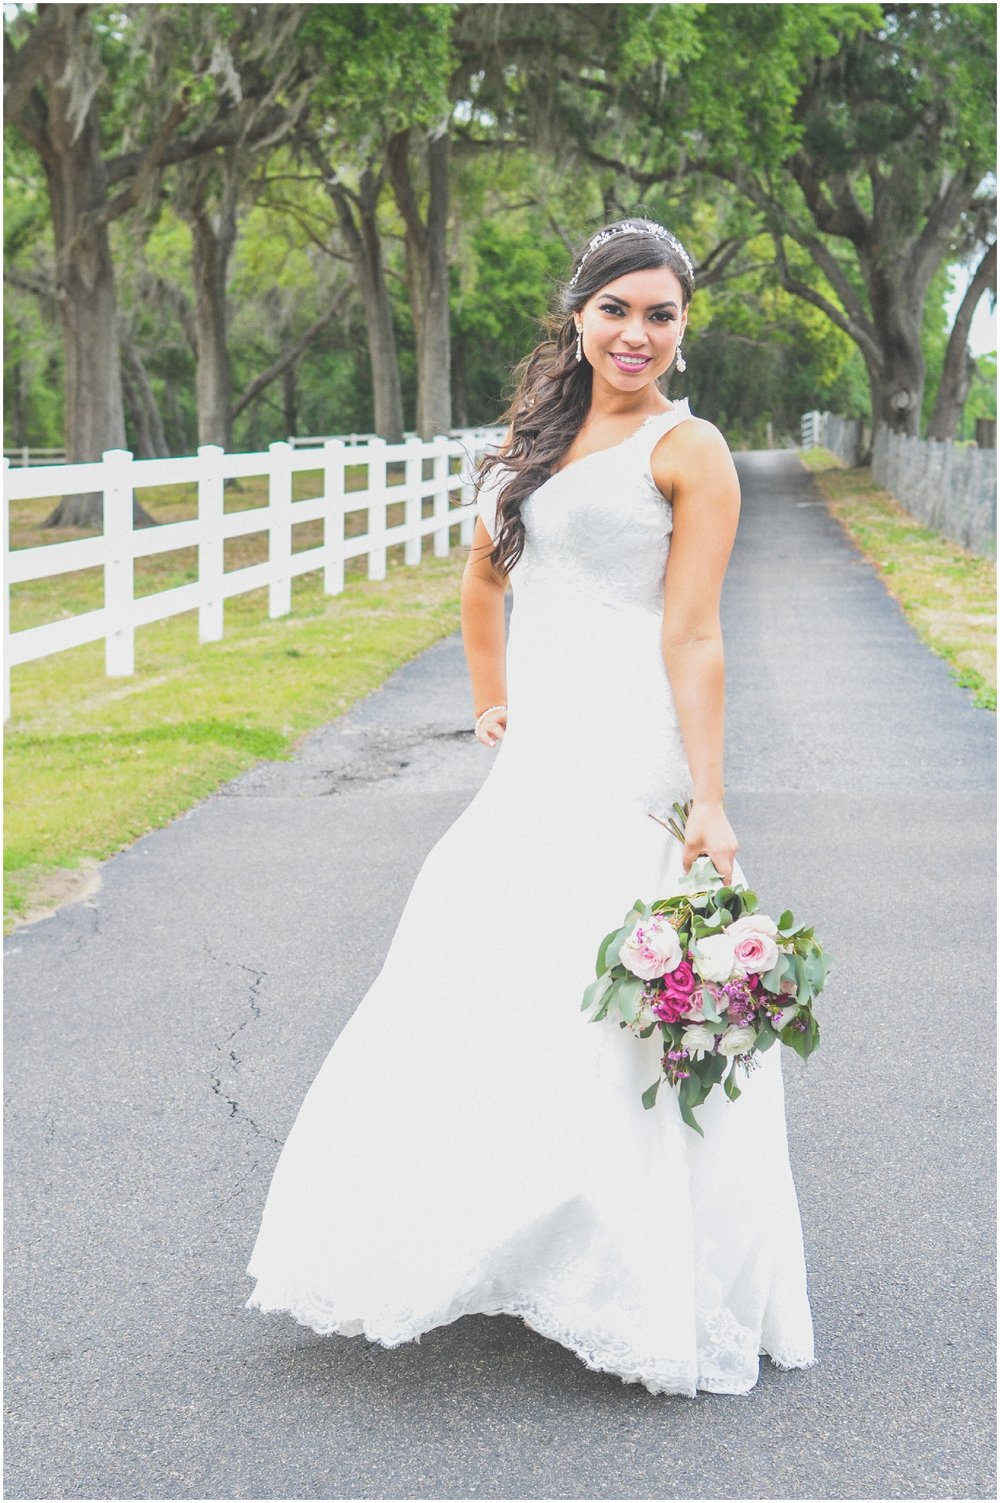 Rustic-Elegant-Wedding-Venue-in-Tampa-Stonebridge-Events_0434.jpg